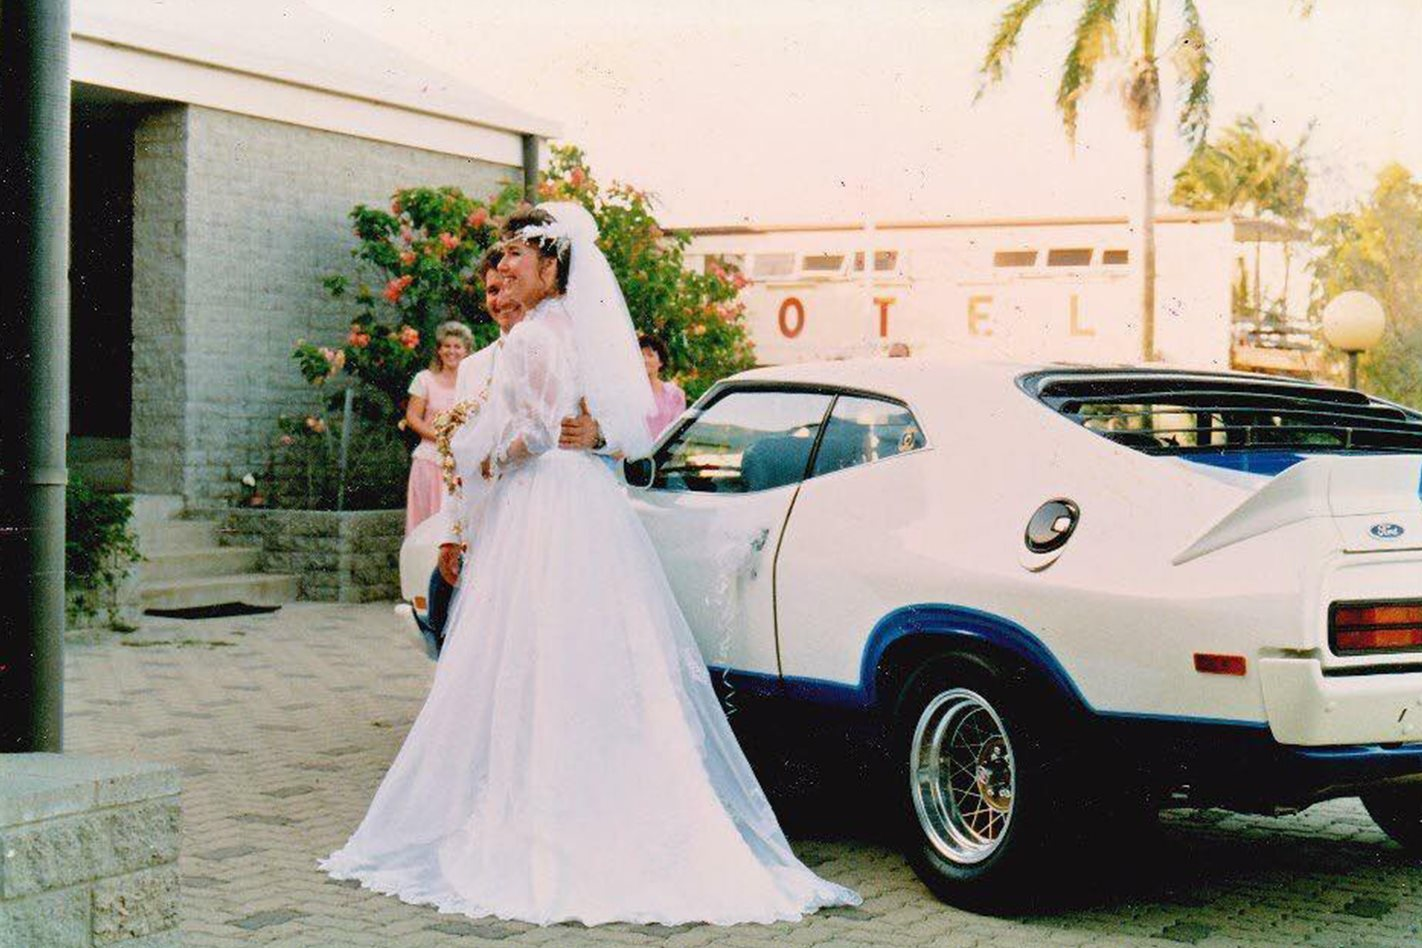 Mandy Paton's wedding cars